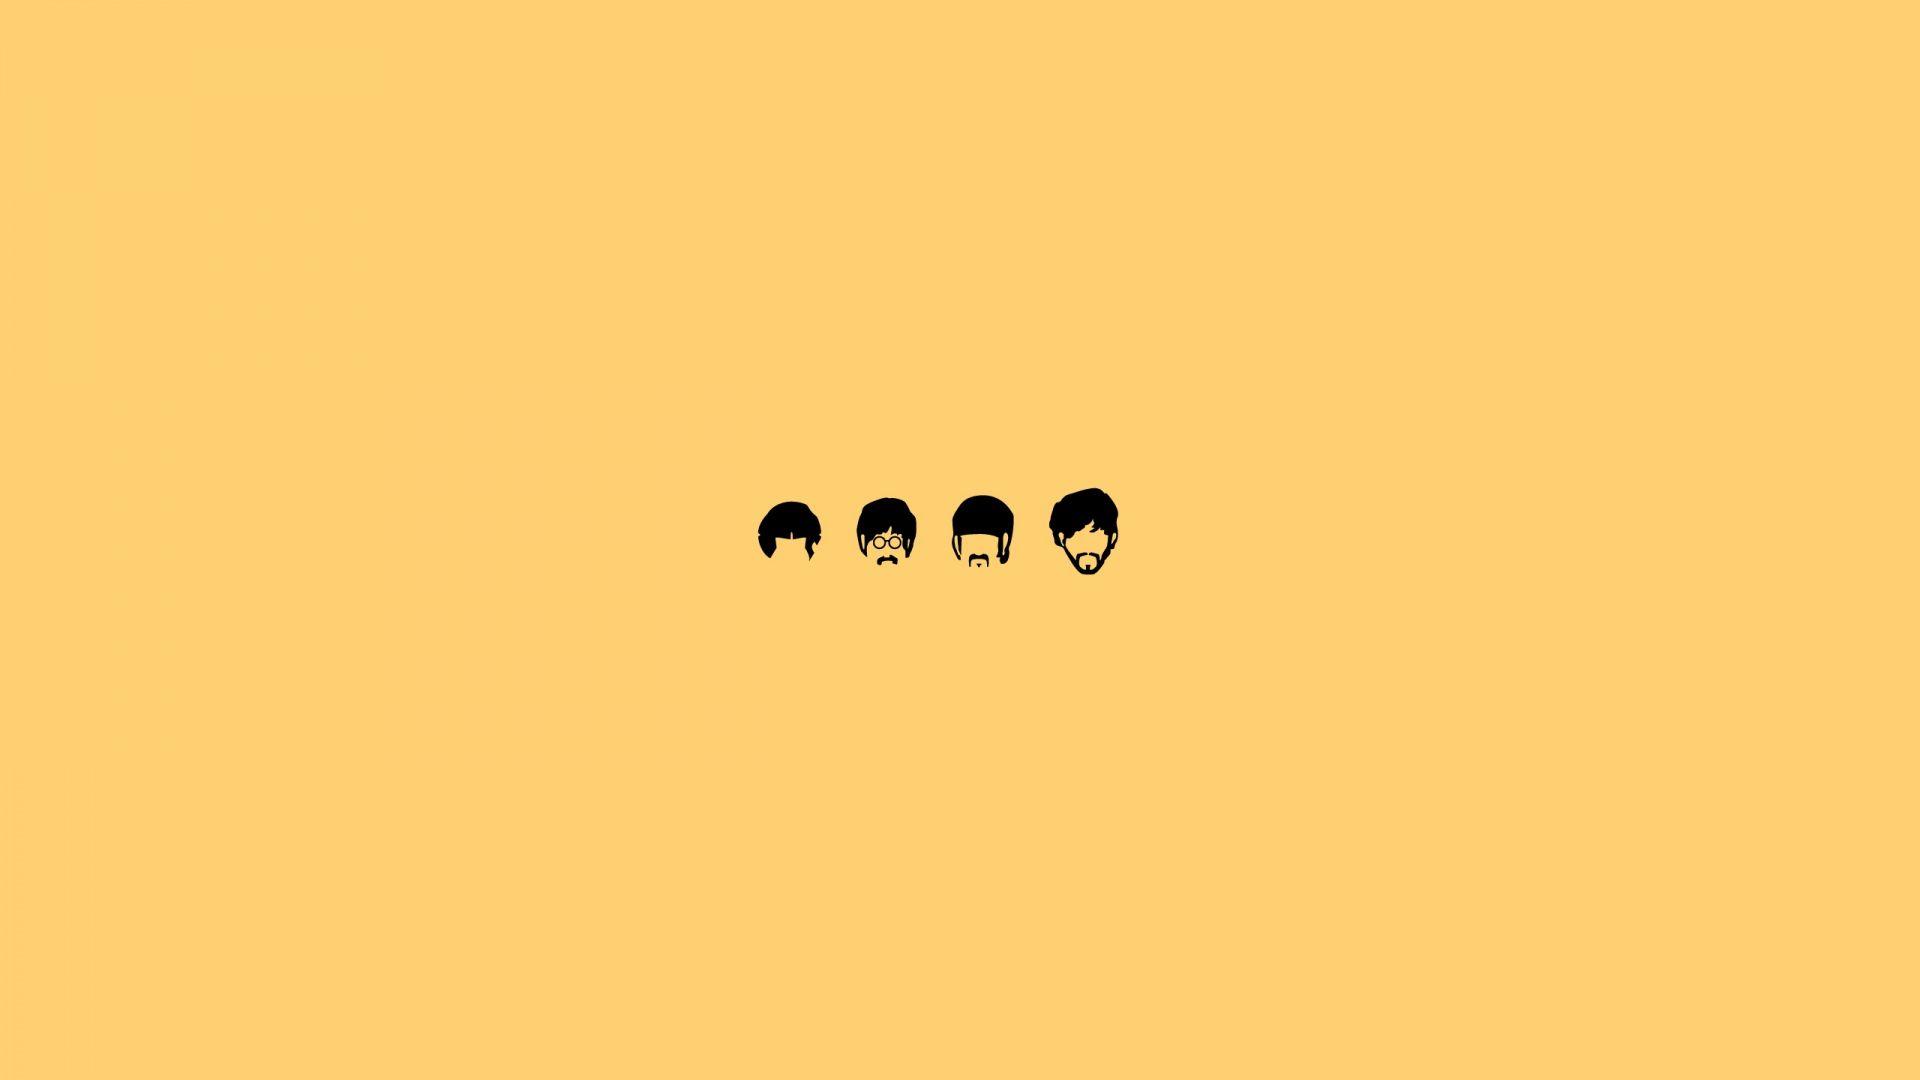 Best 15 The Beatles Wallpapers The Beatles Minimalist Wallpaper Beatles Wallpaper Aesthetic Desktop Wallpaper